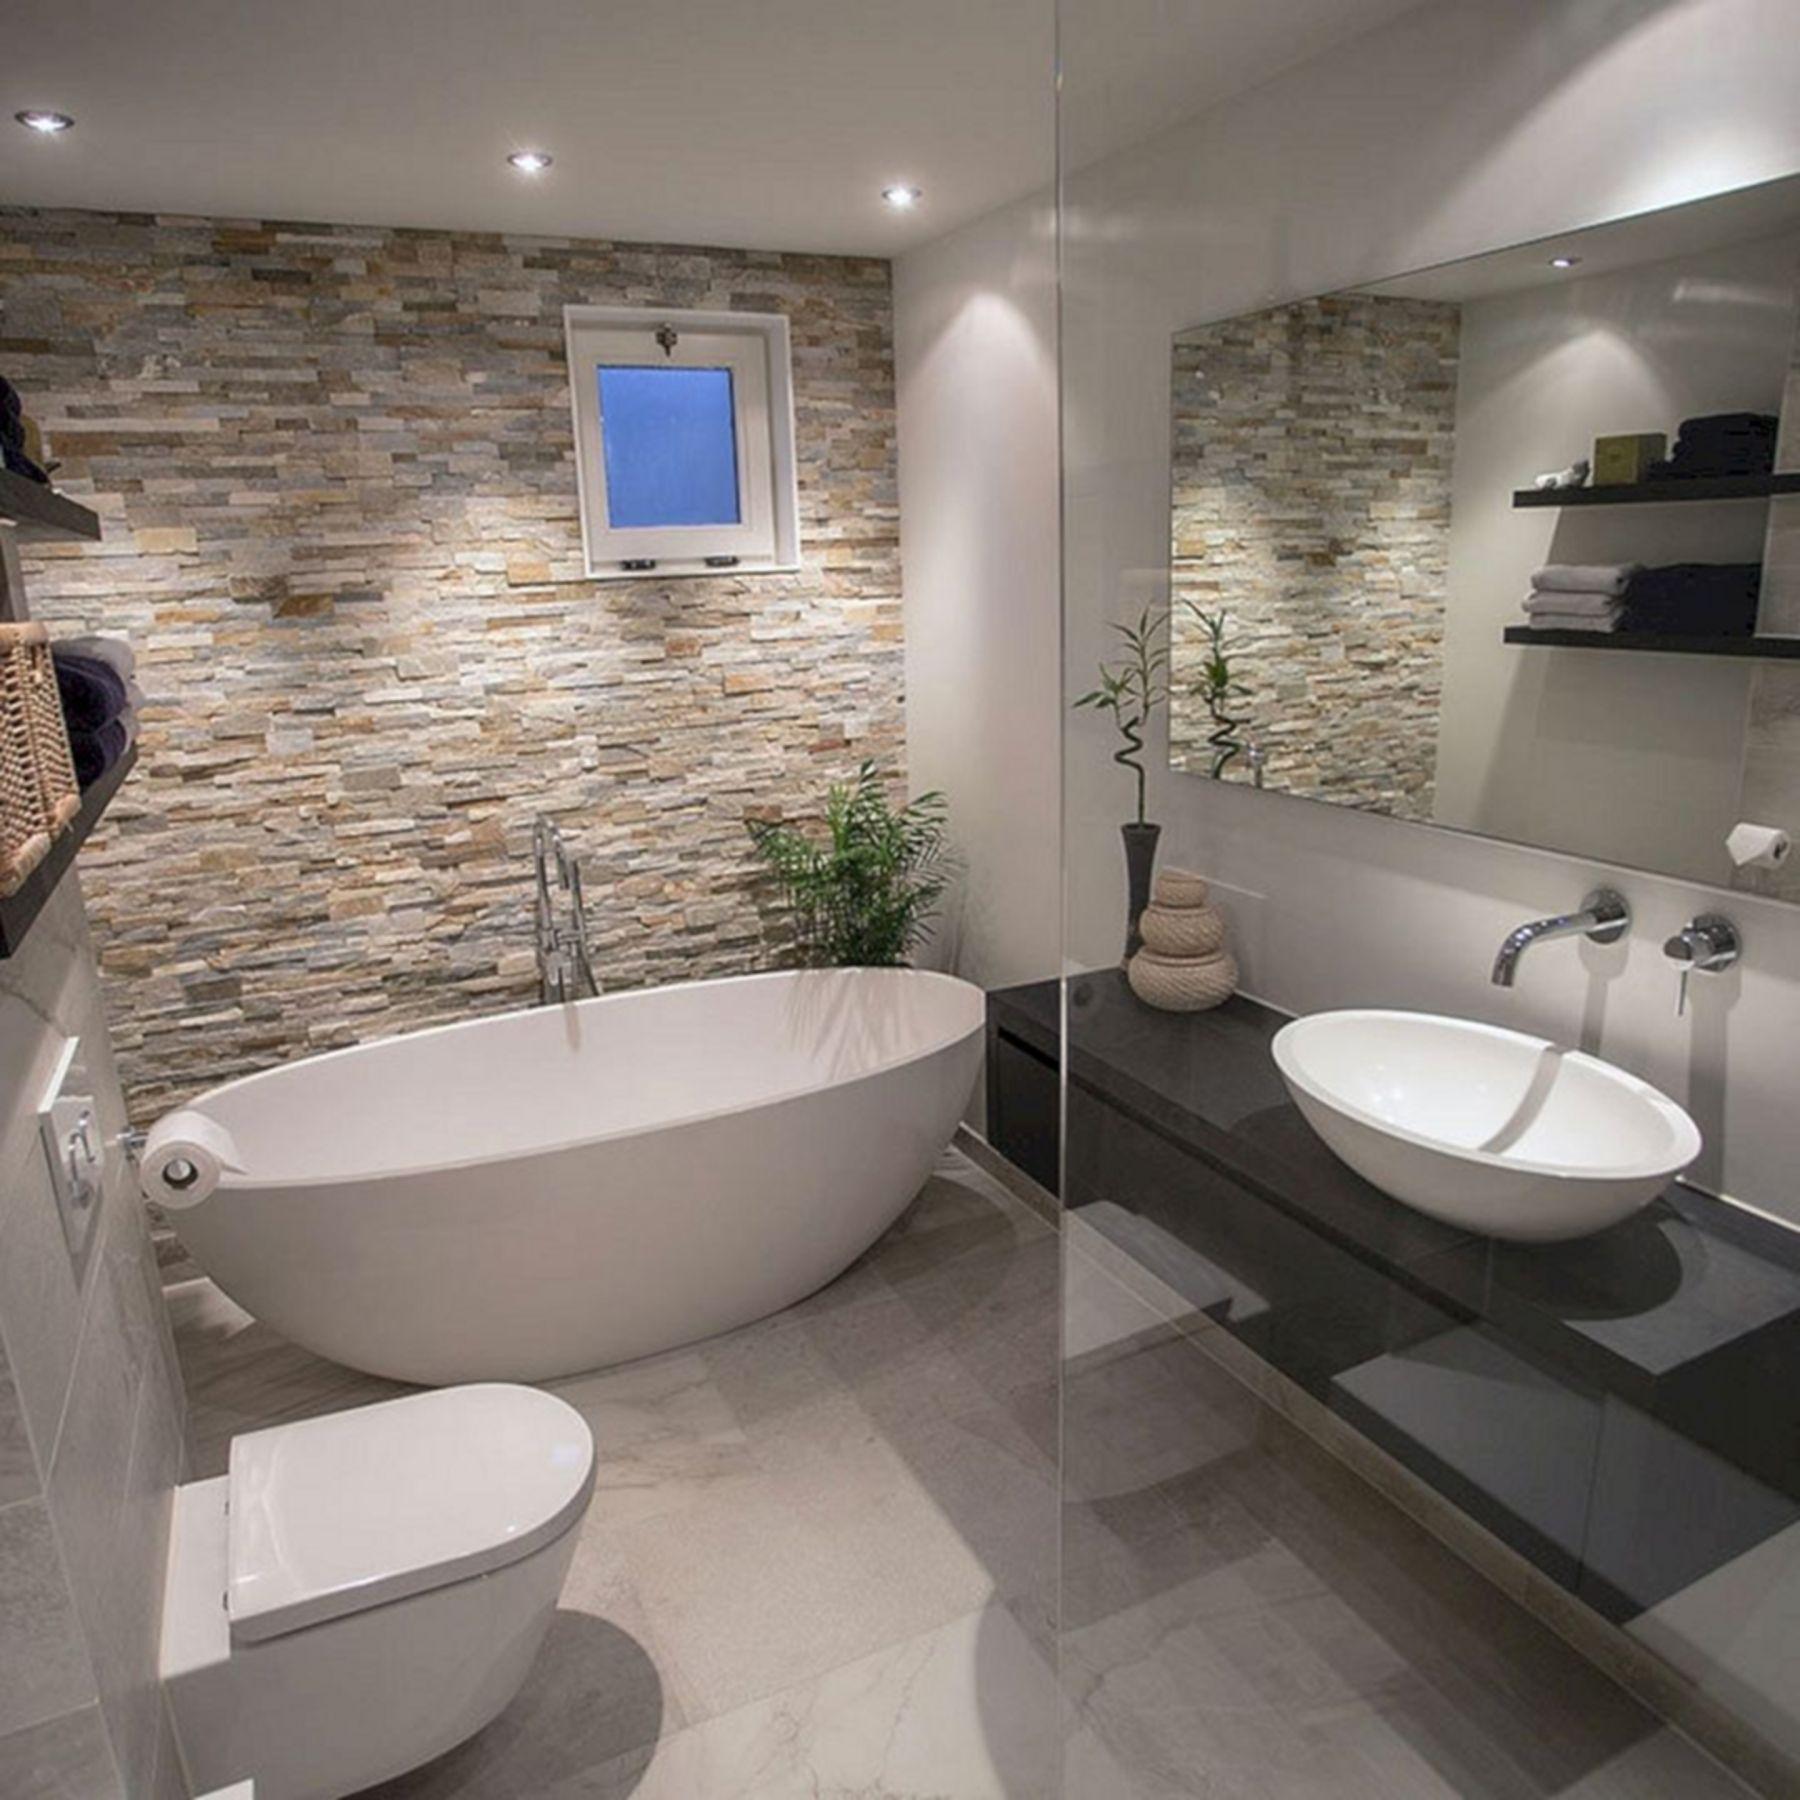 10 creative natural stone wall bathroom decoration ideas on bathroom renovation ideas australia id=96345